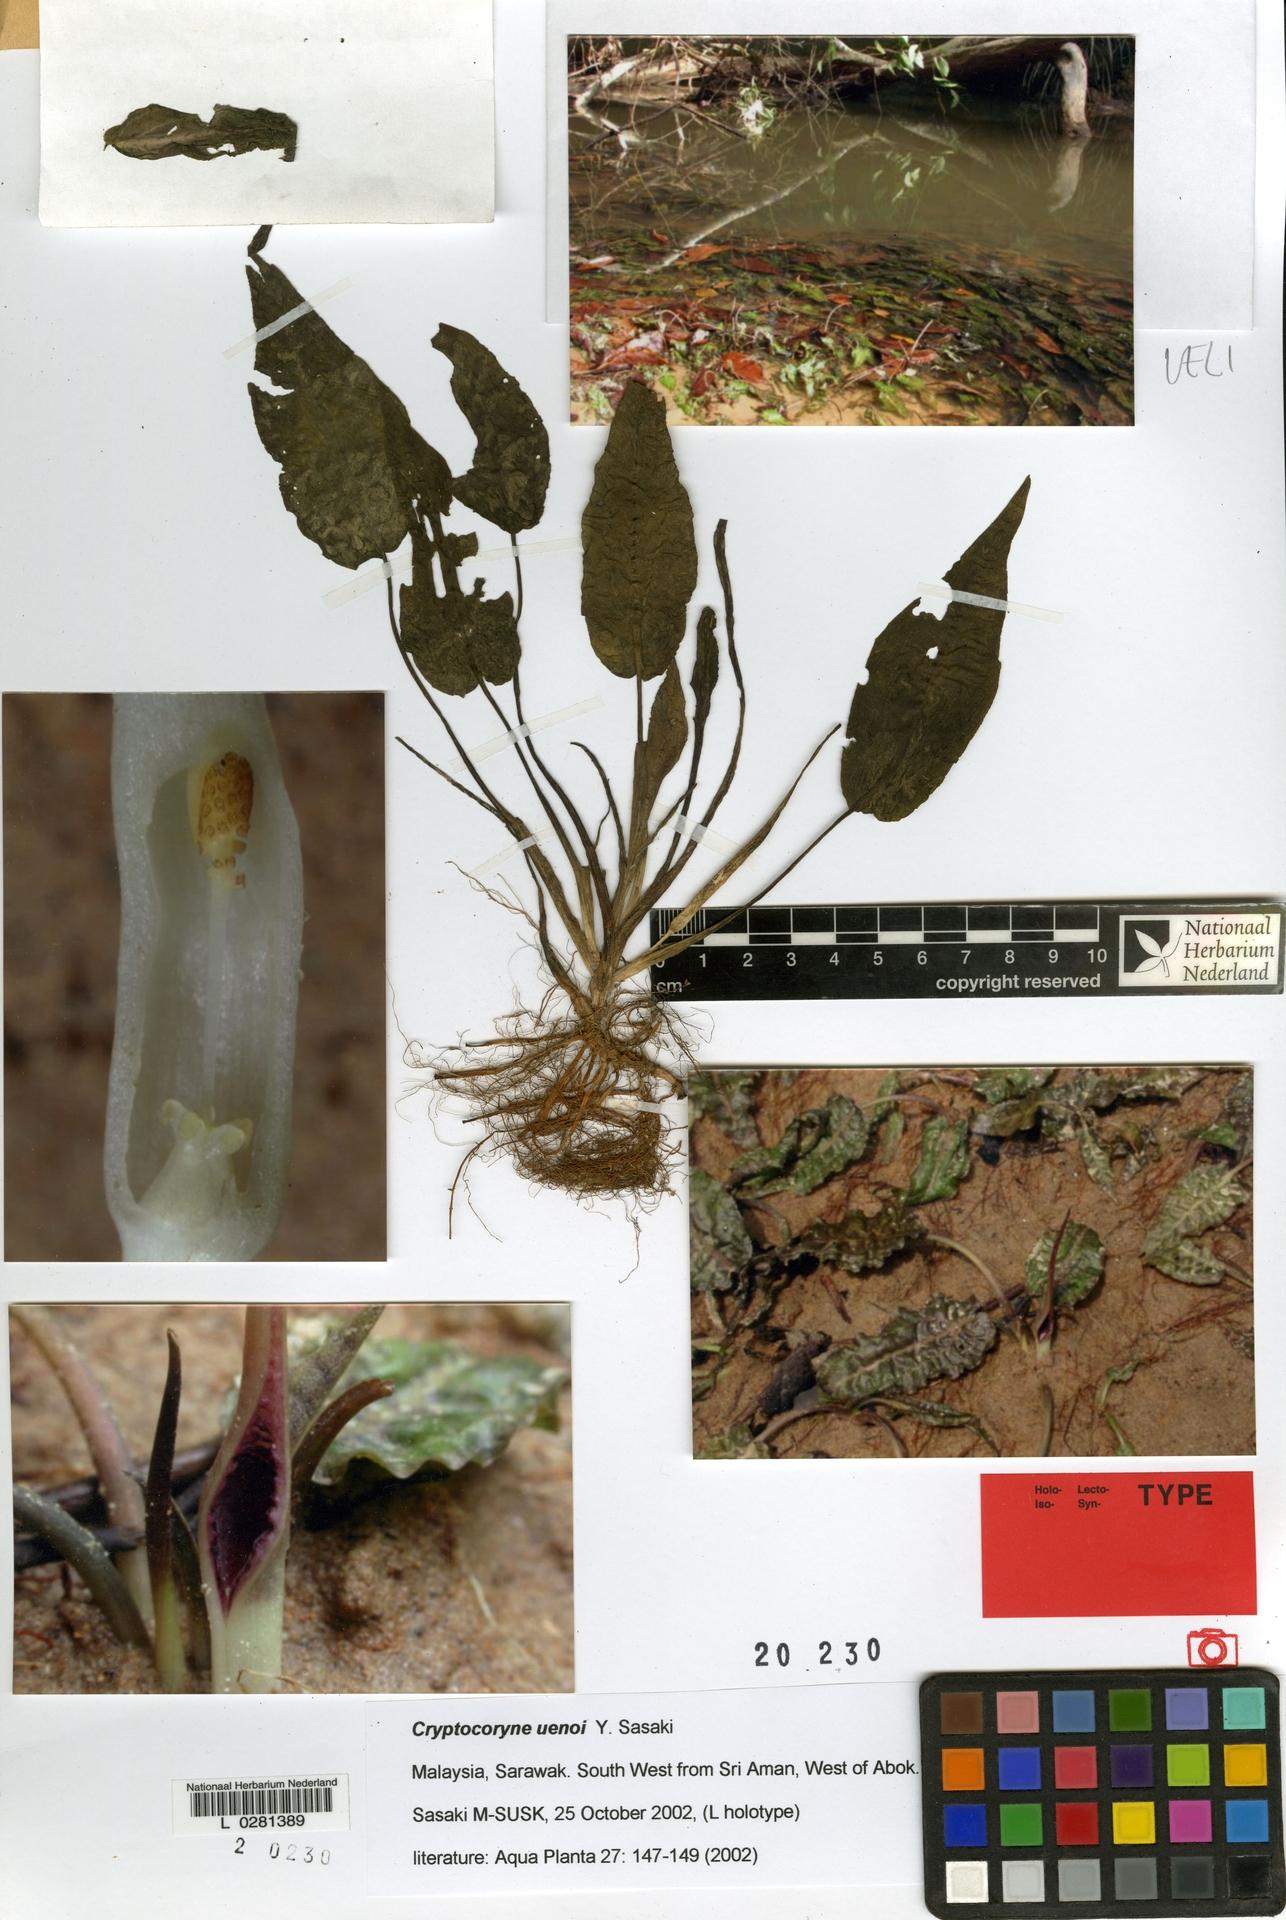 L  0281389 | Cryptocoryne uenoi Y.Sasaki